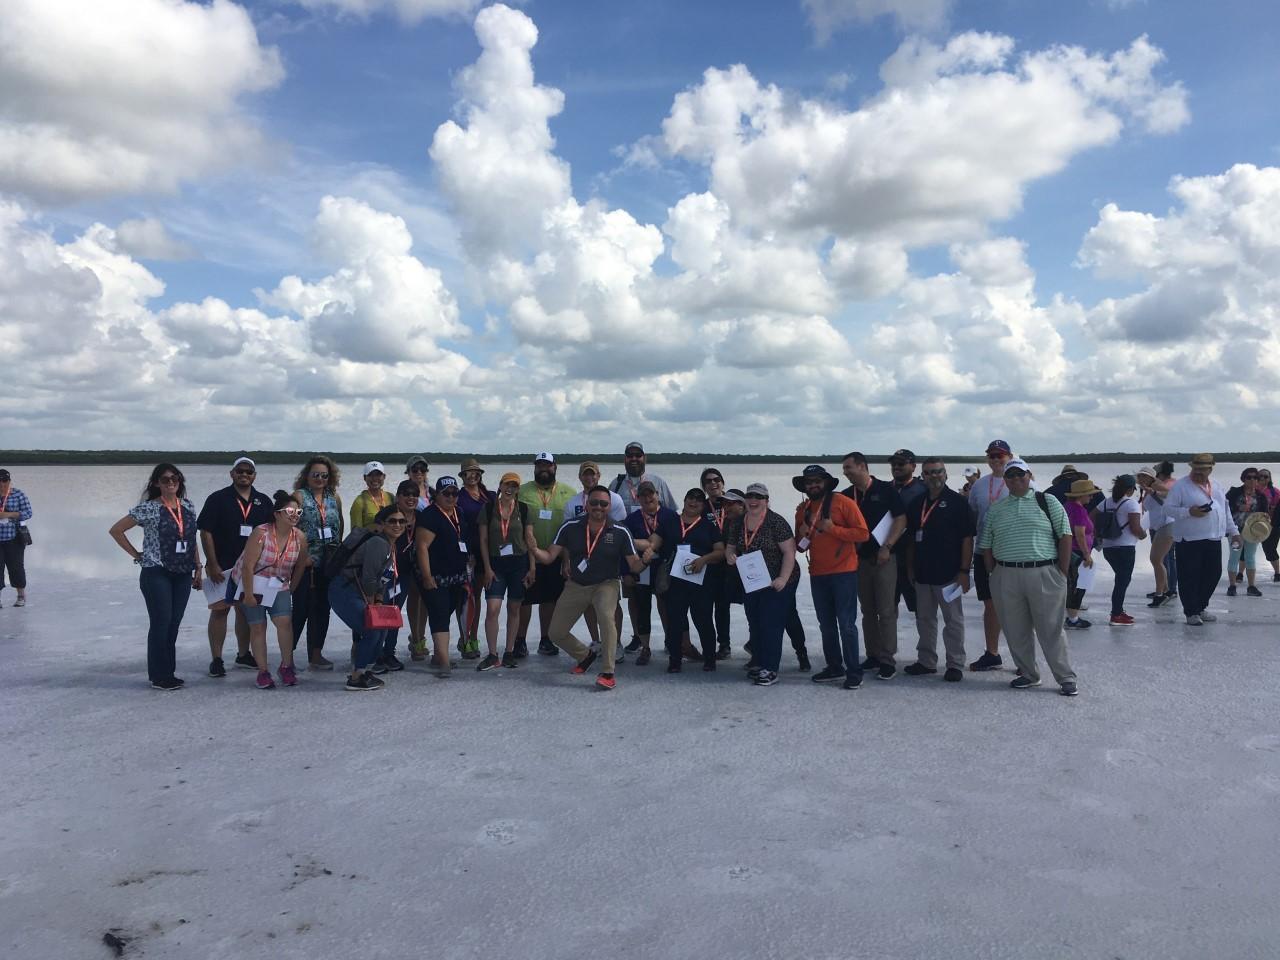 Group Photo of whole group along the lakeshore